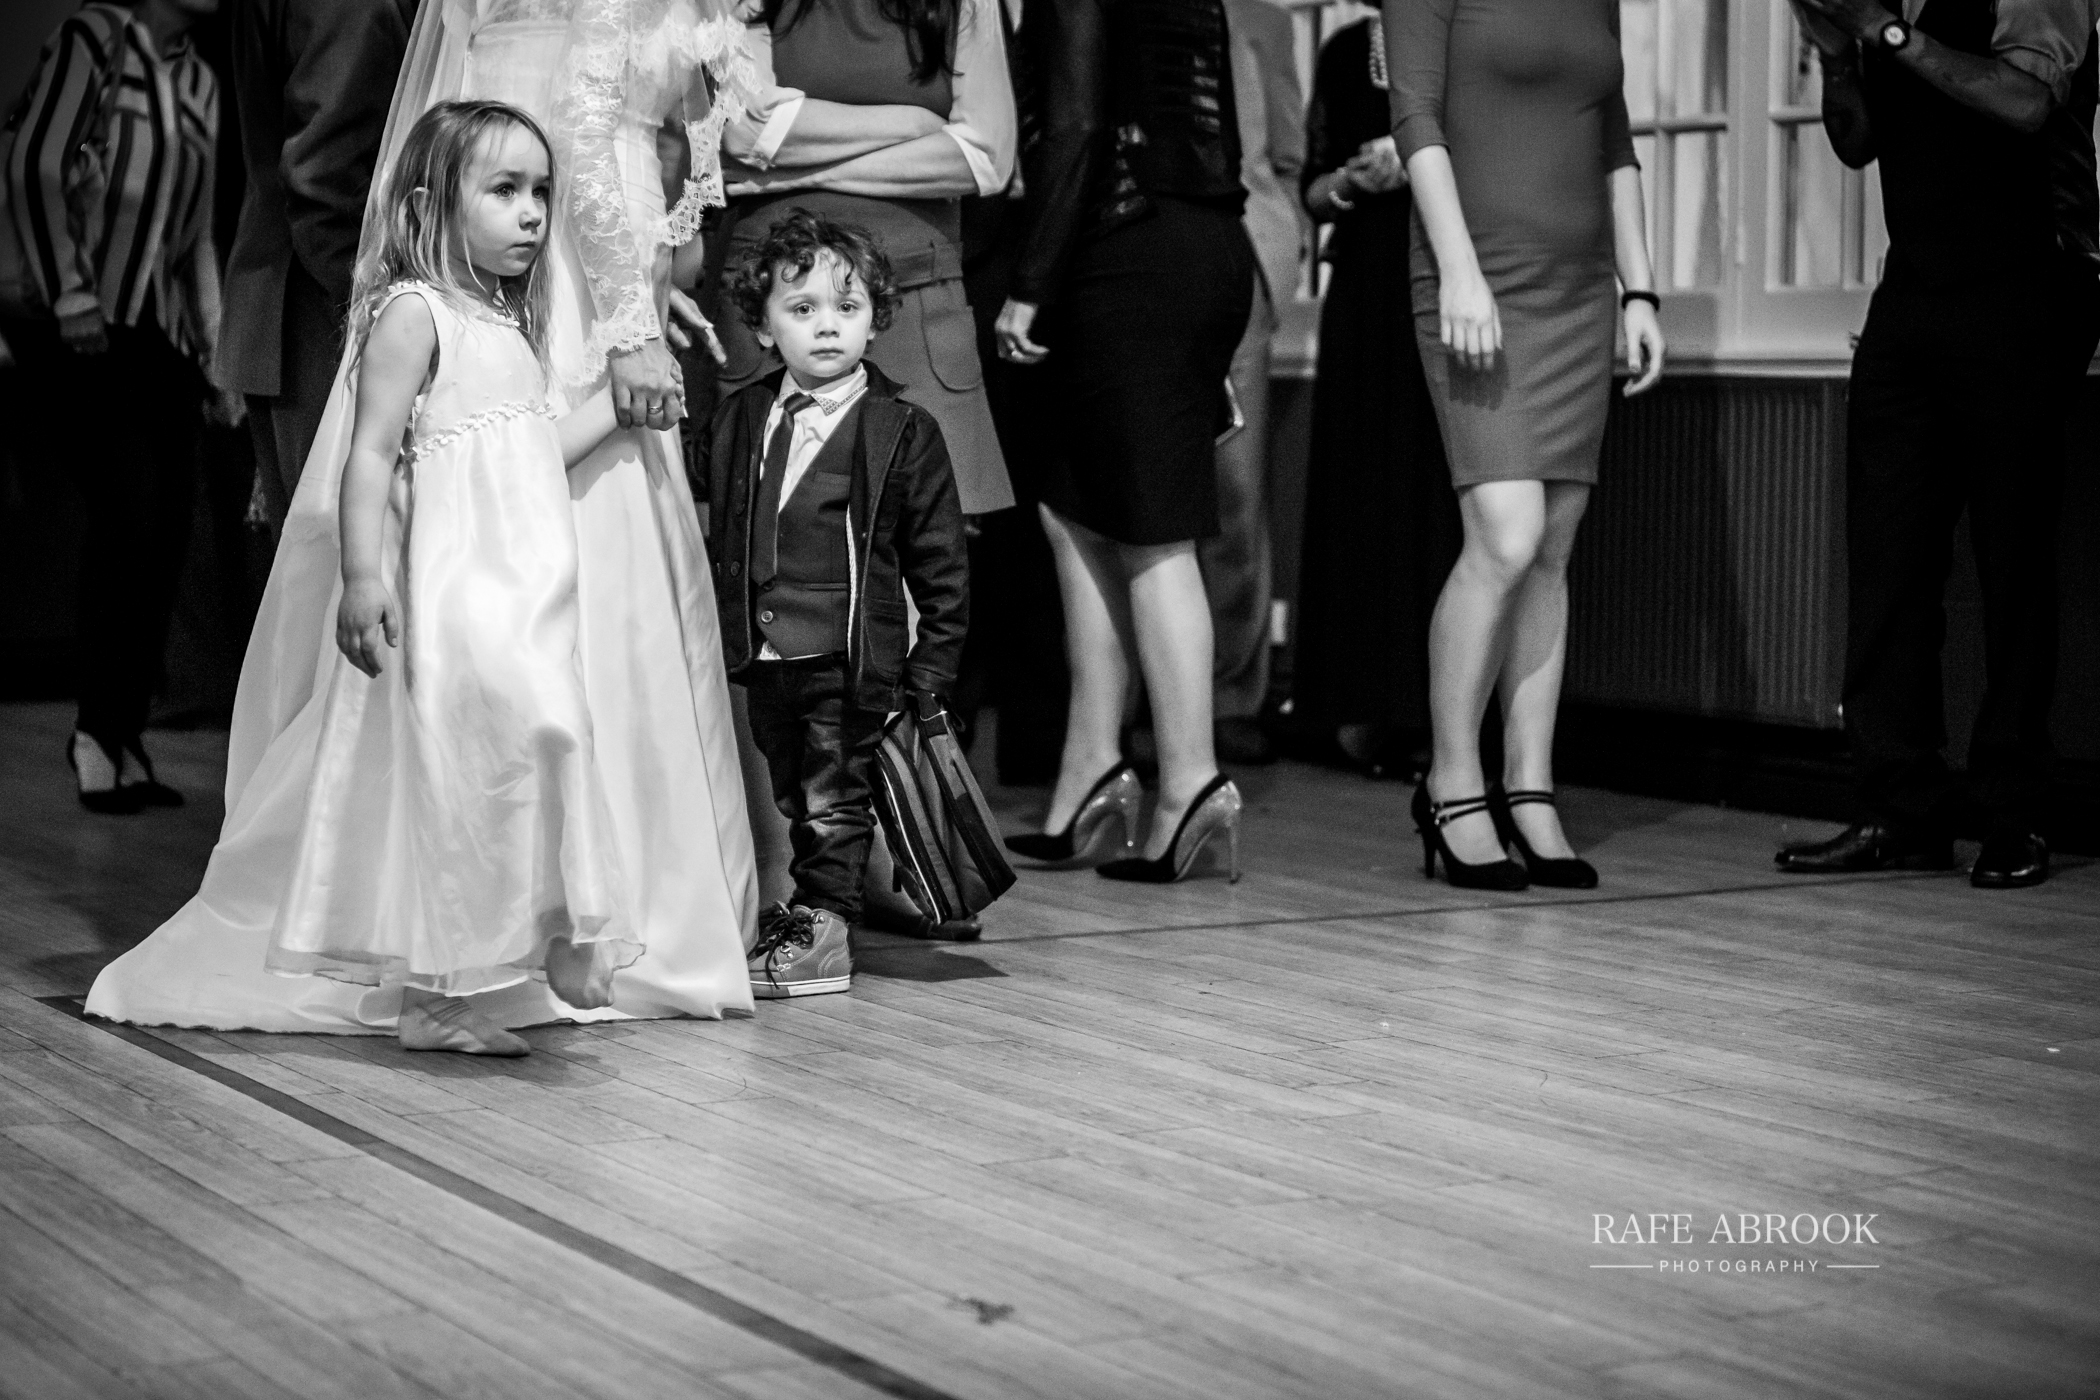 roma & pete wedding hampstead shenley hertfordshire -562.jpg